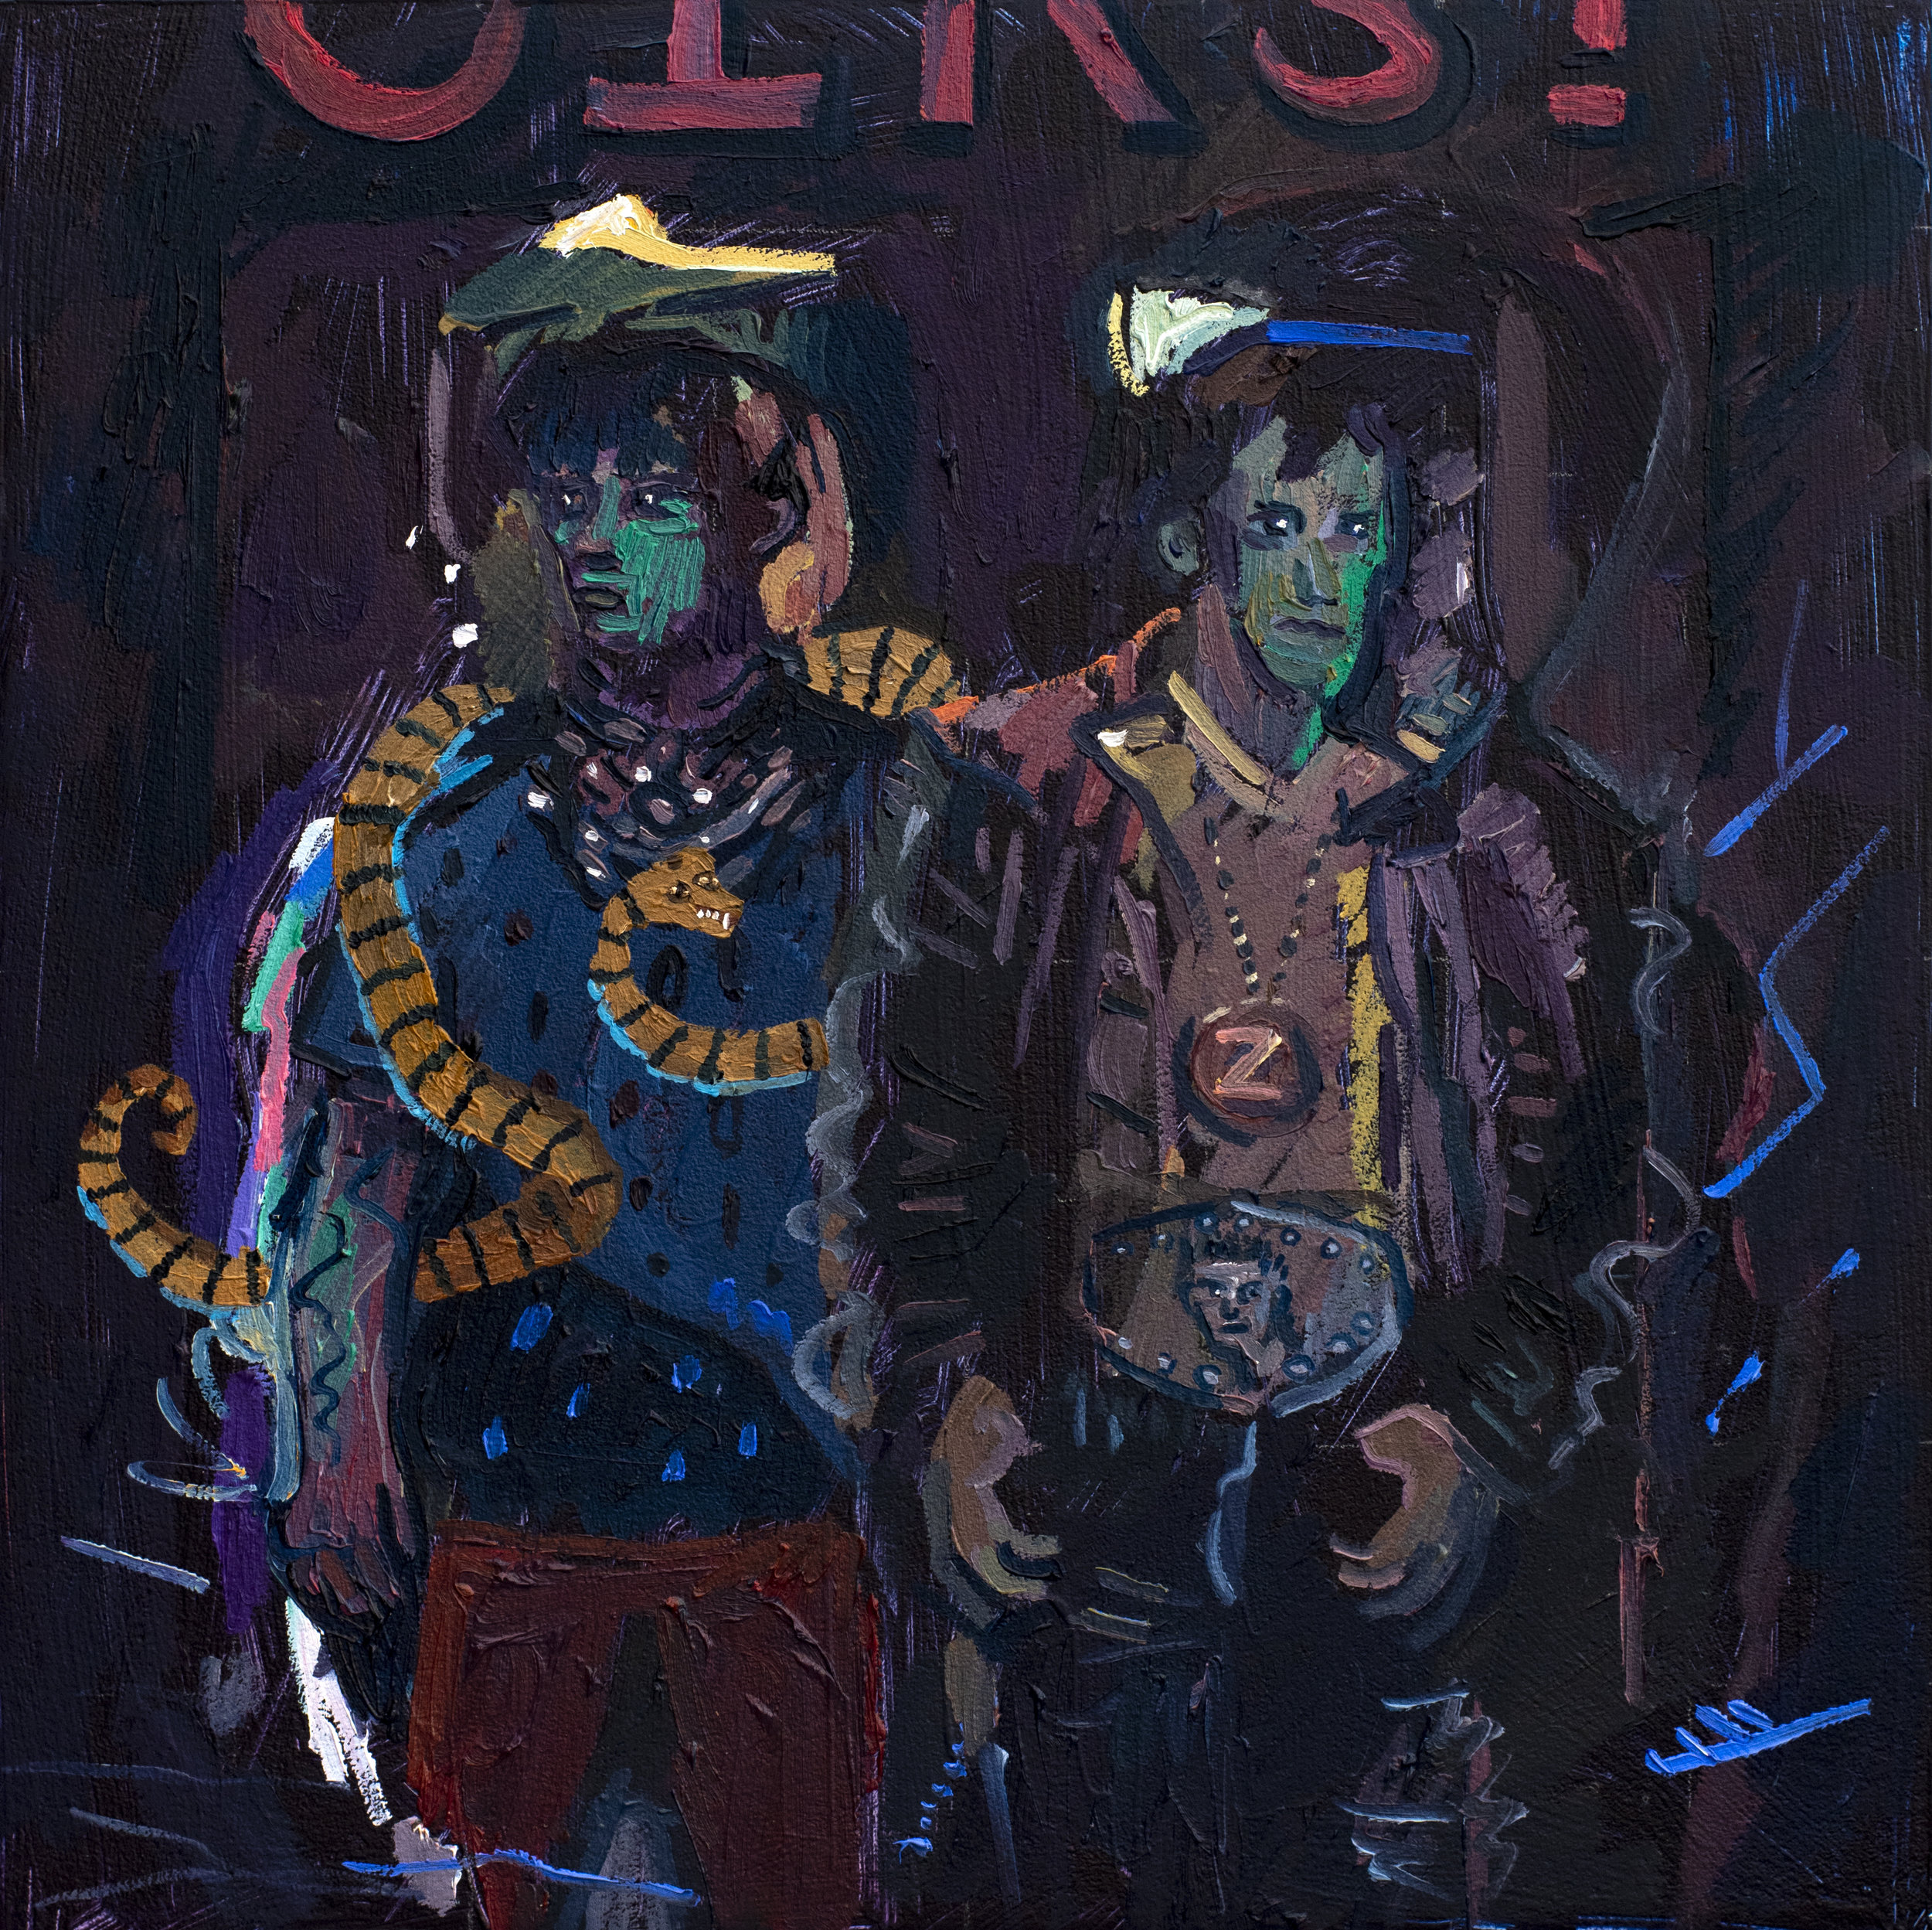 Suspicion, Murder and Mr Snake Enter a Bar, 2019, Oil on Canvas, 35cm x 35cm